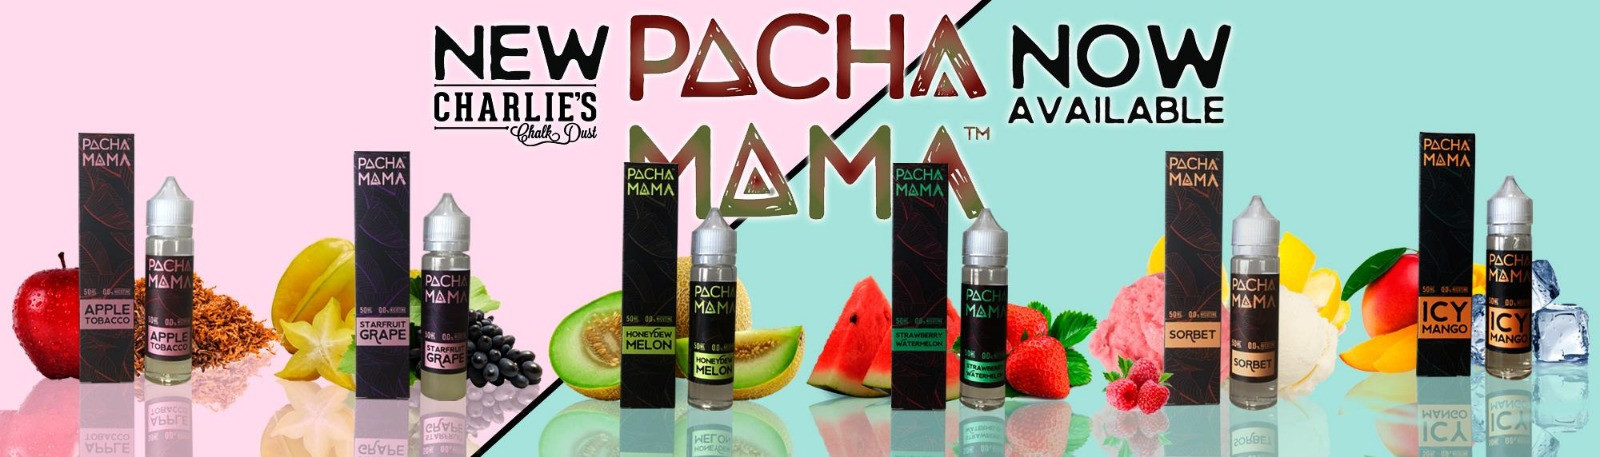 Shortfill Pacha Mama Subohm 50 ml